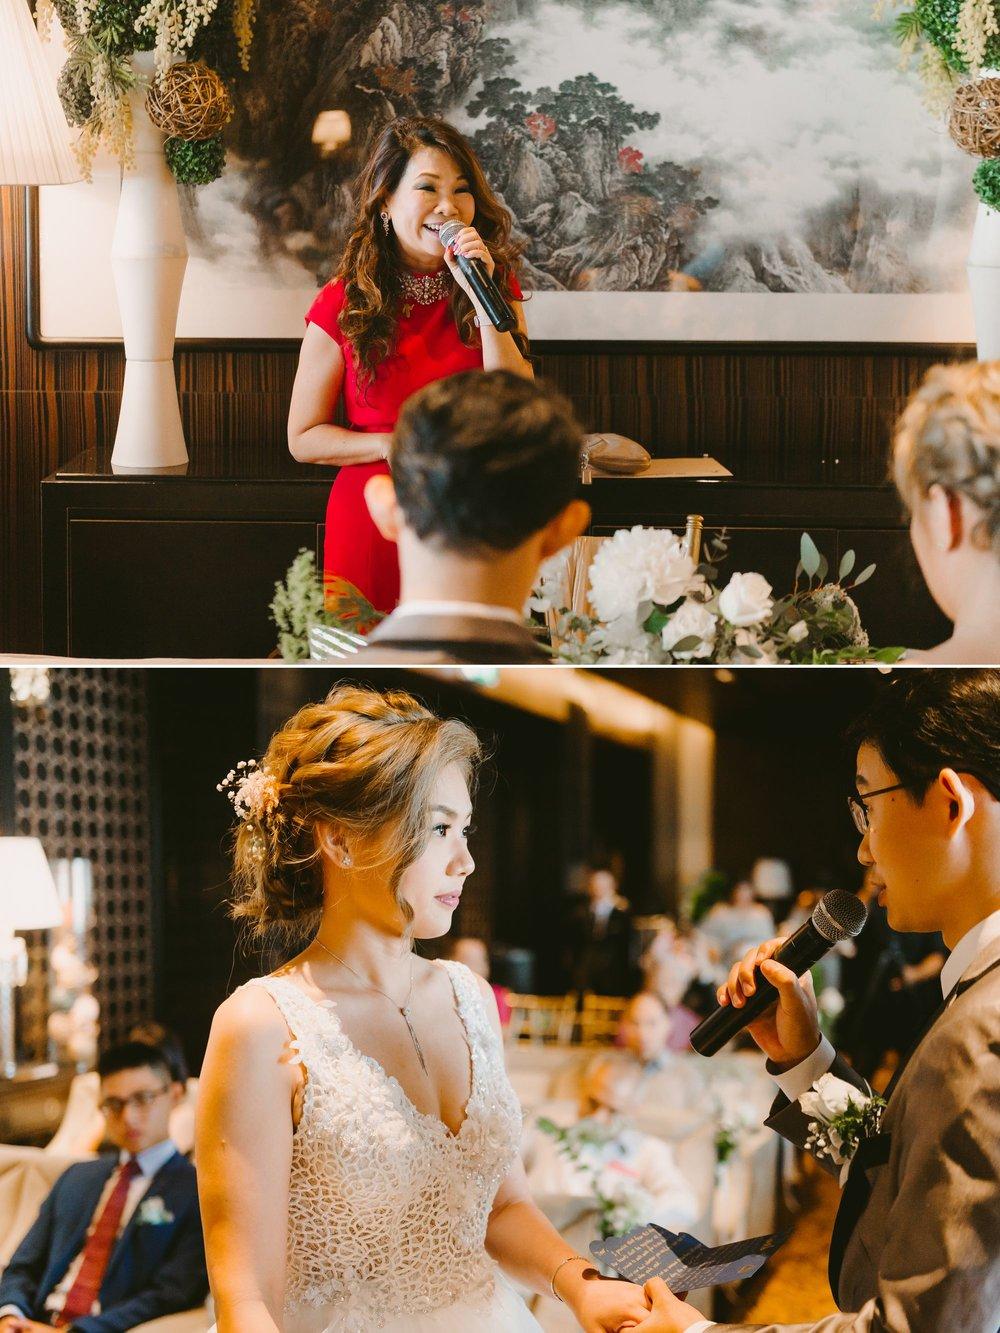 wedding_photographer_singapore 21.jpg